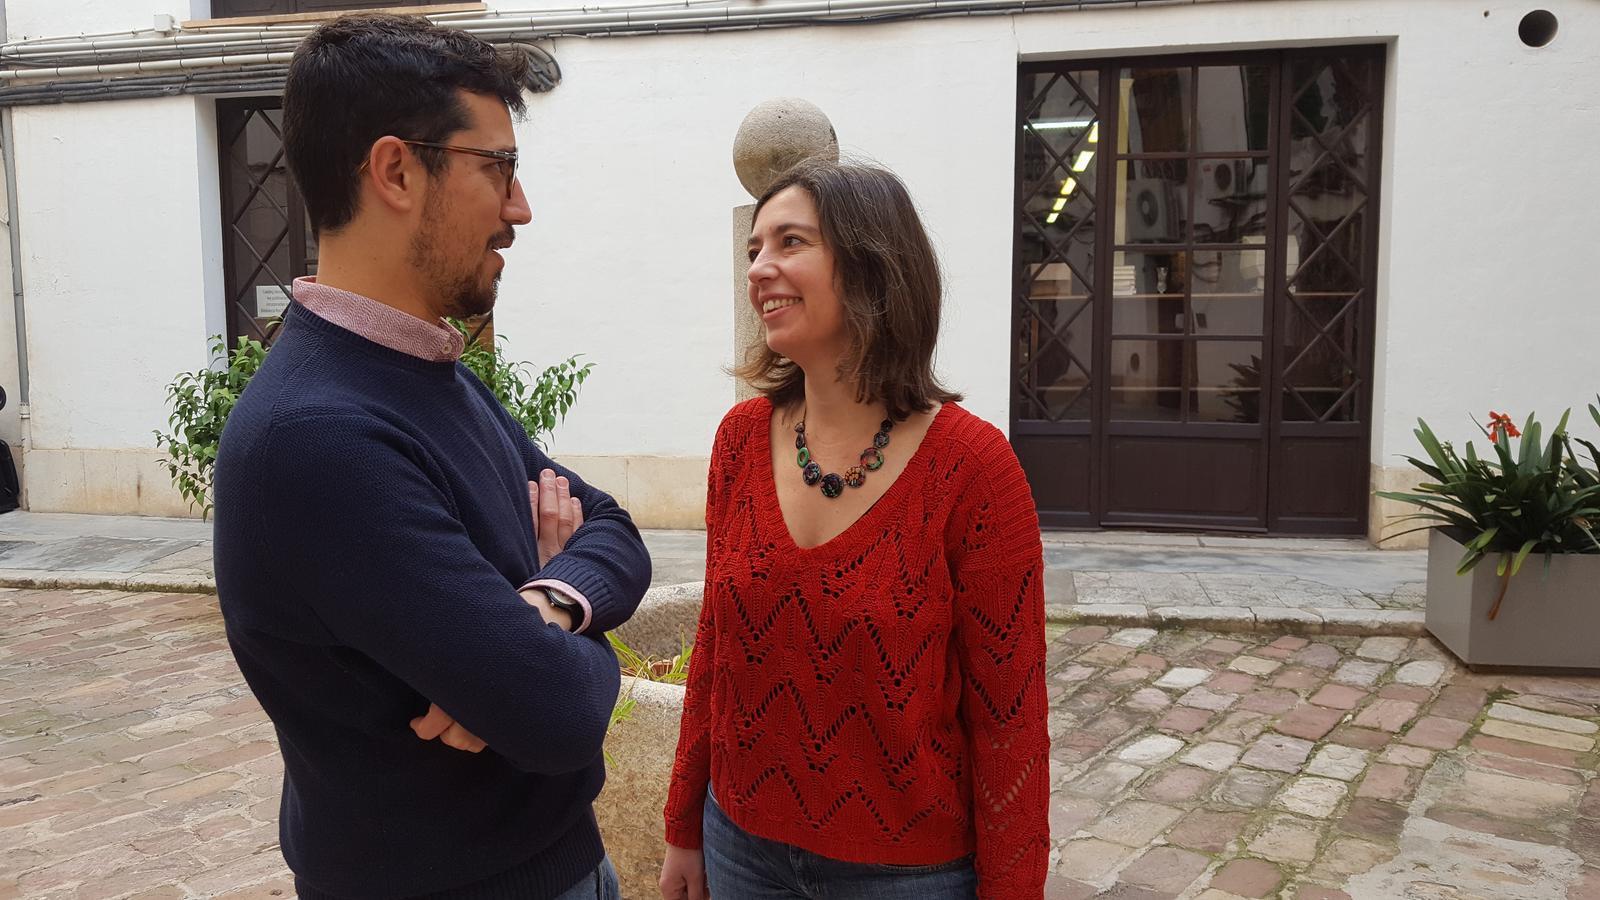 El director general d'energia, Ferran Rosa i la presidenta d'EMAYA, Neus Truyol